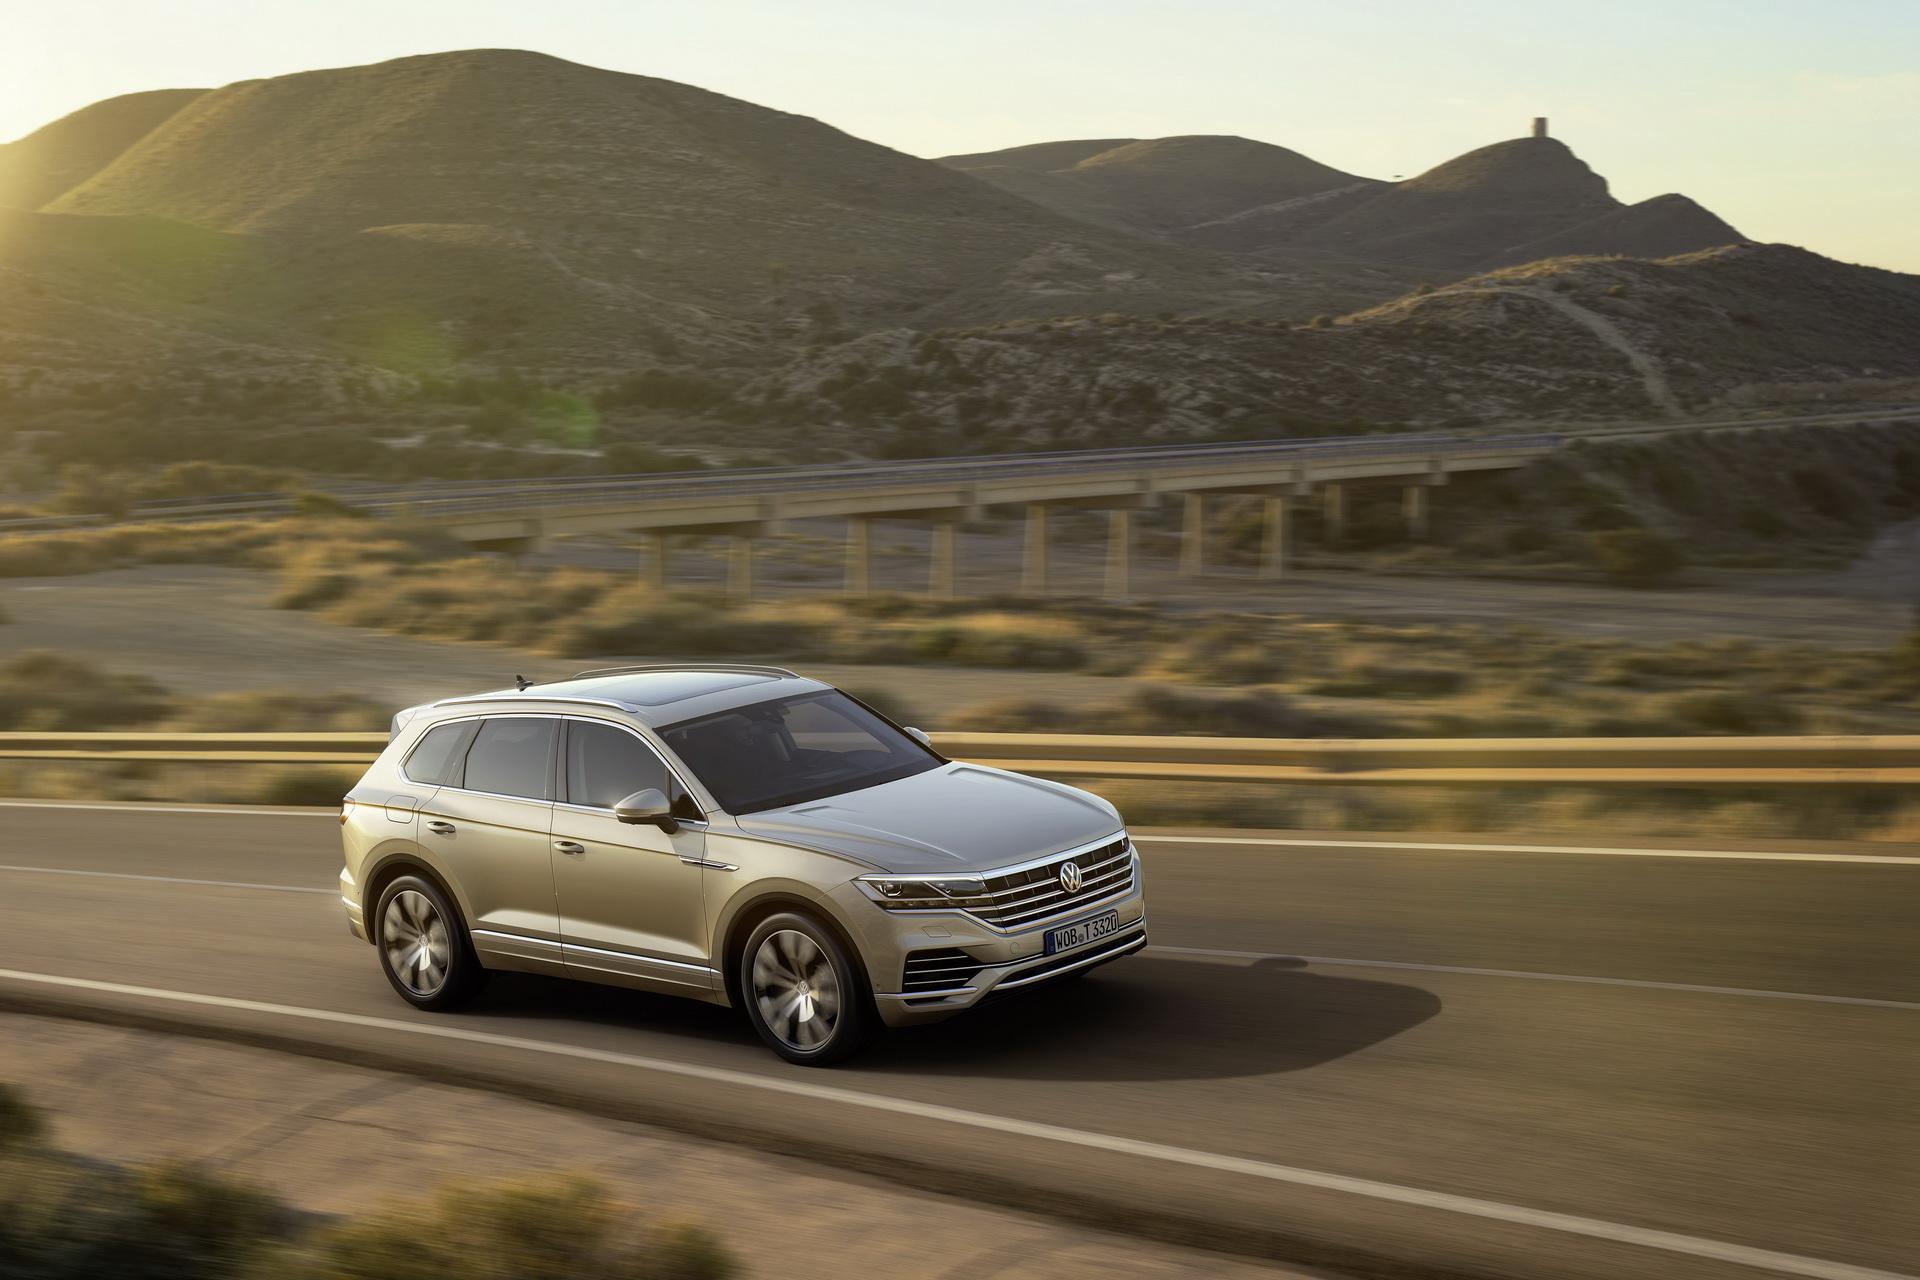 Volkswagen Touareg 2018 (9)